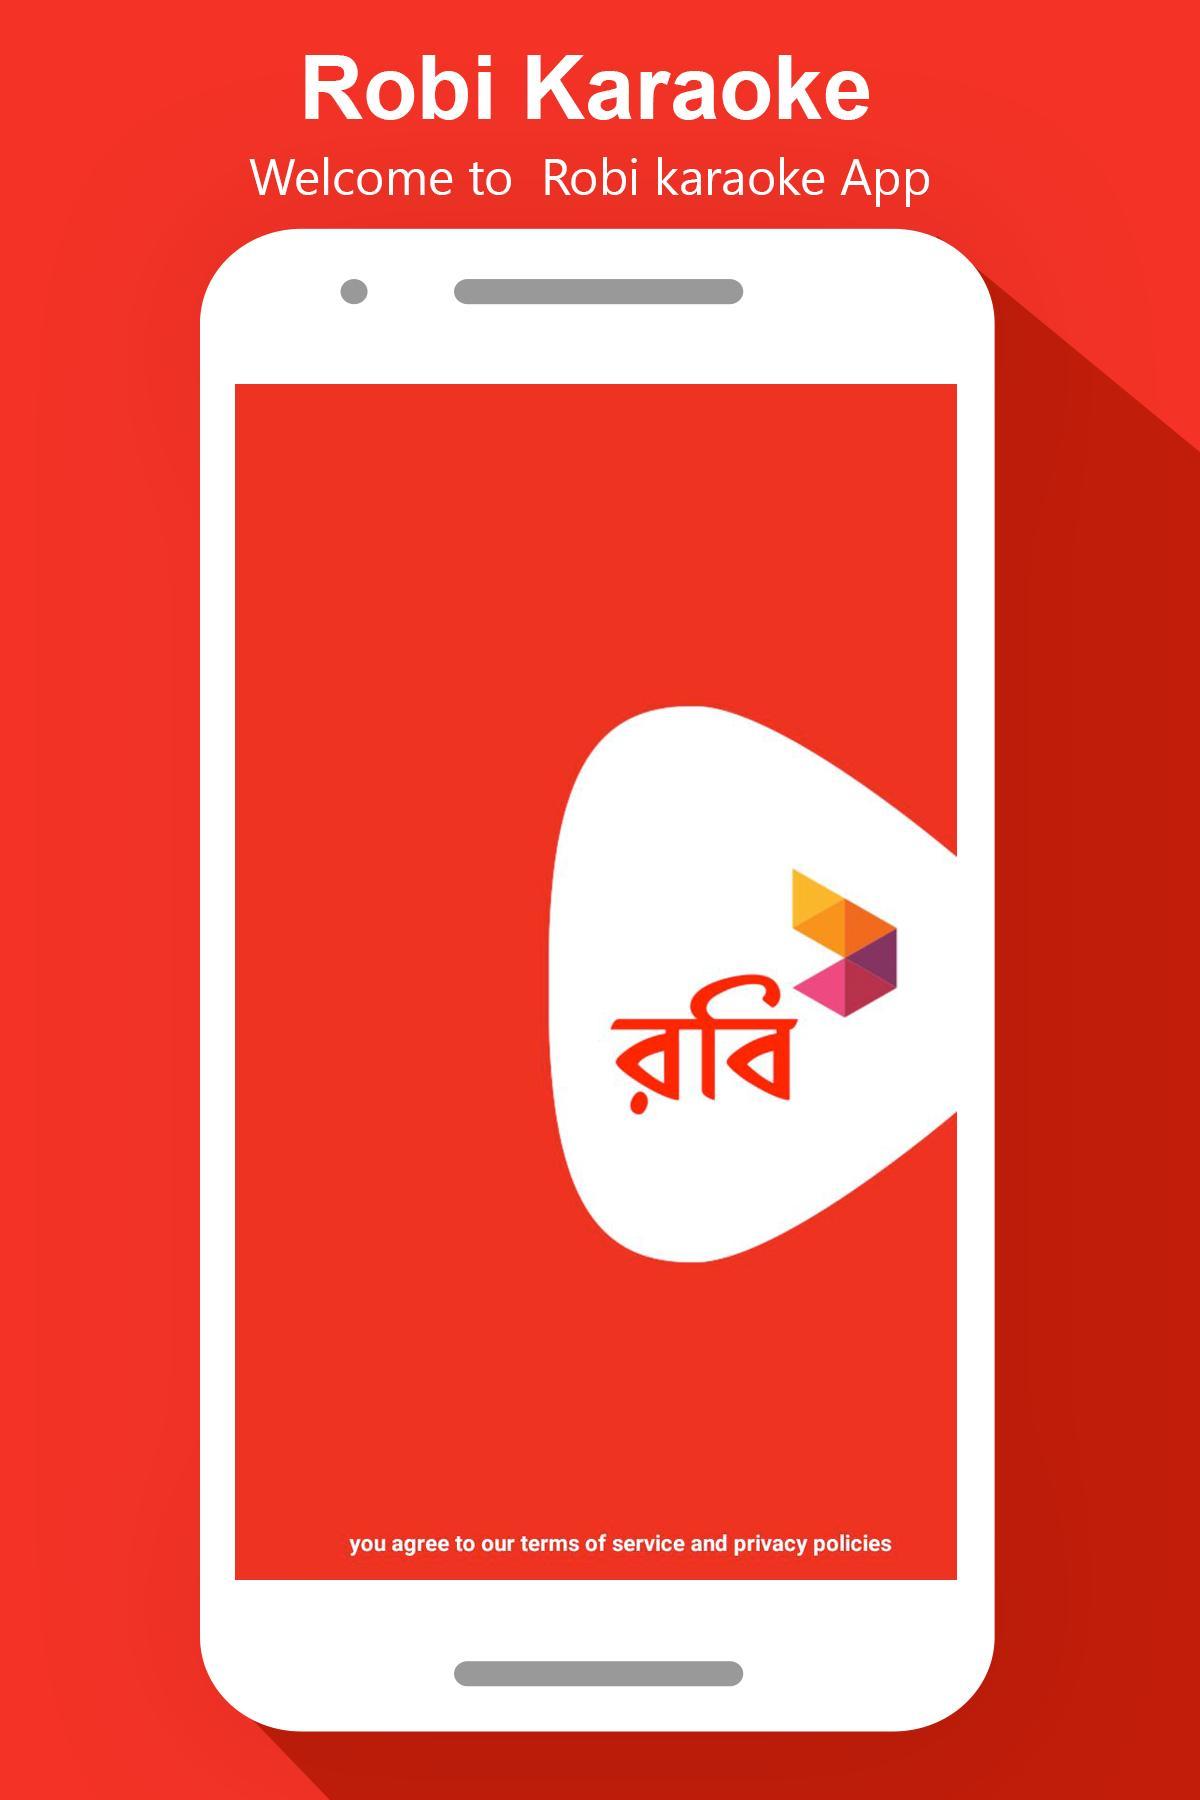 Robi Karaoke for Android - APK Download